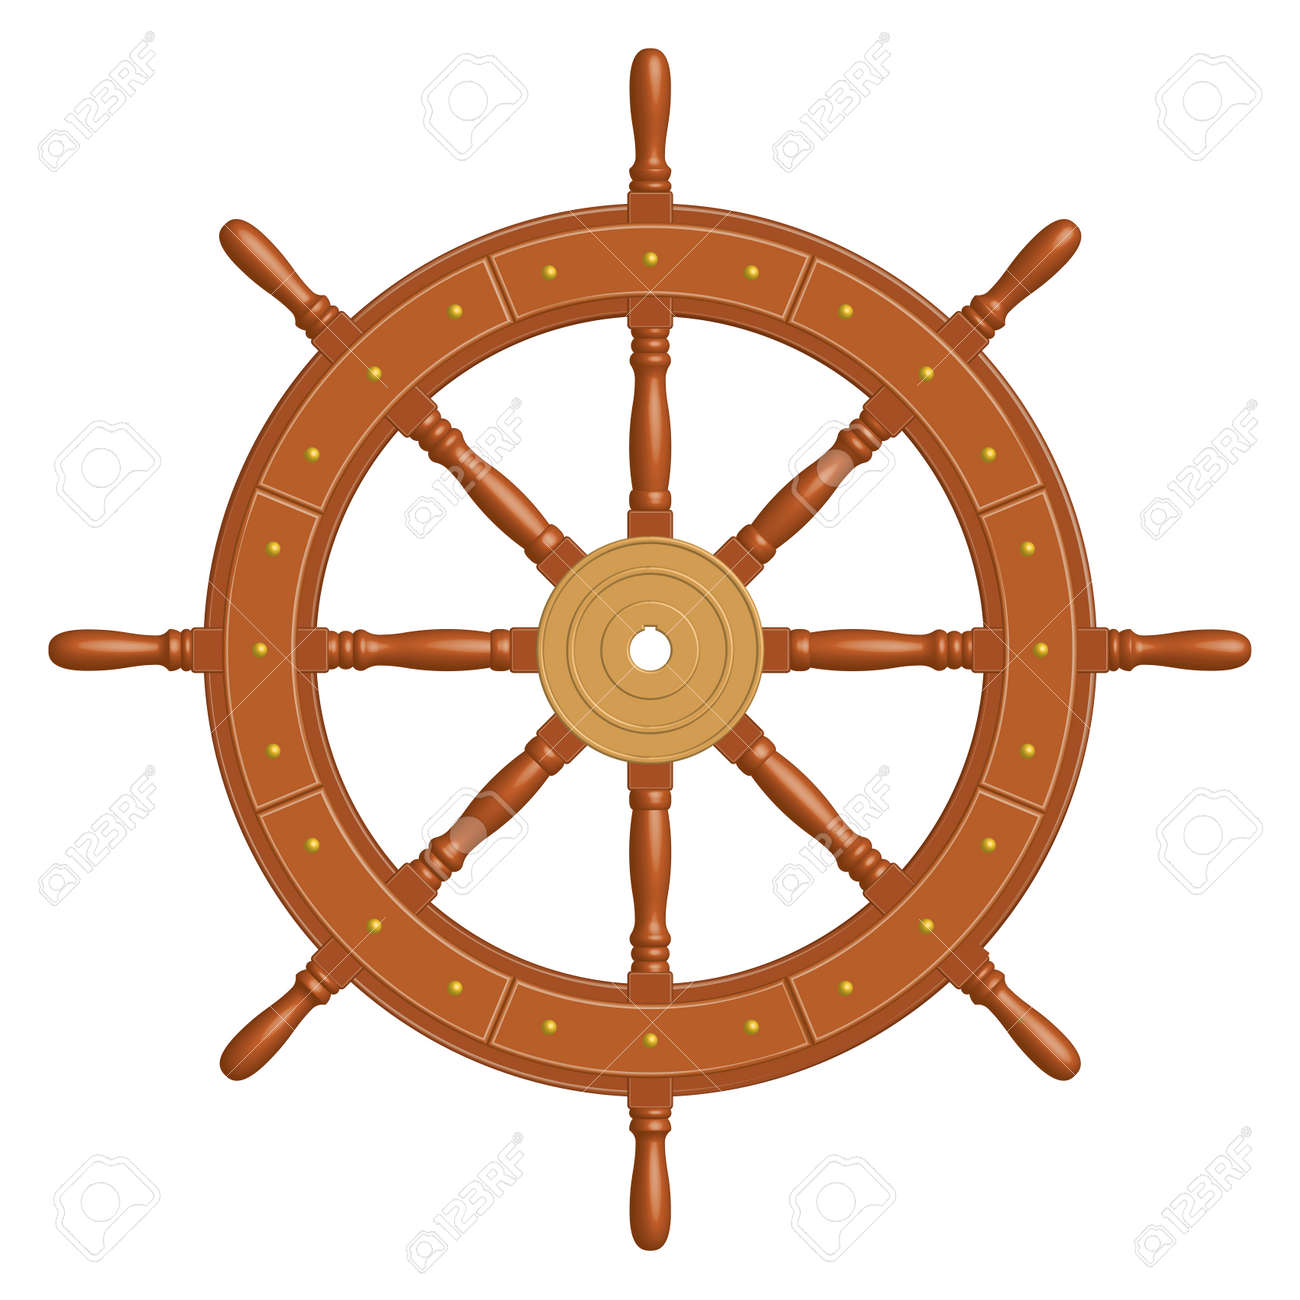 8 spoke wooden ship wheel. Vintage style. - 139157879